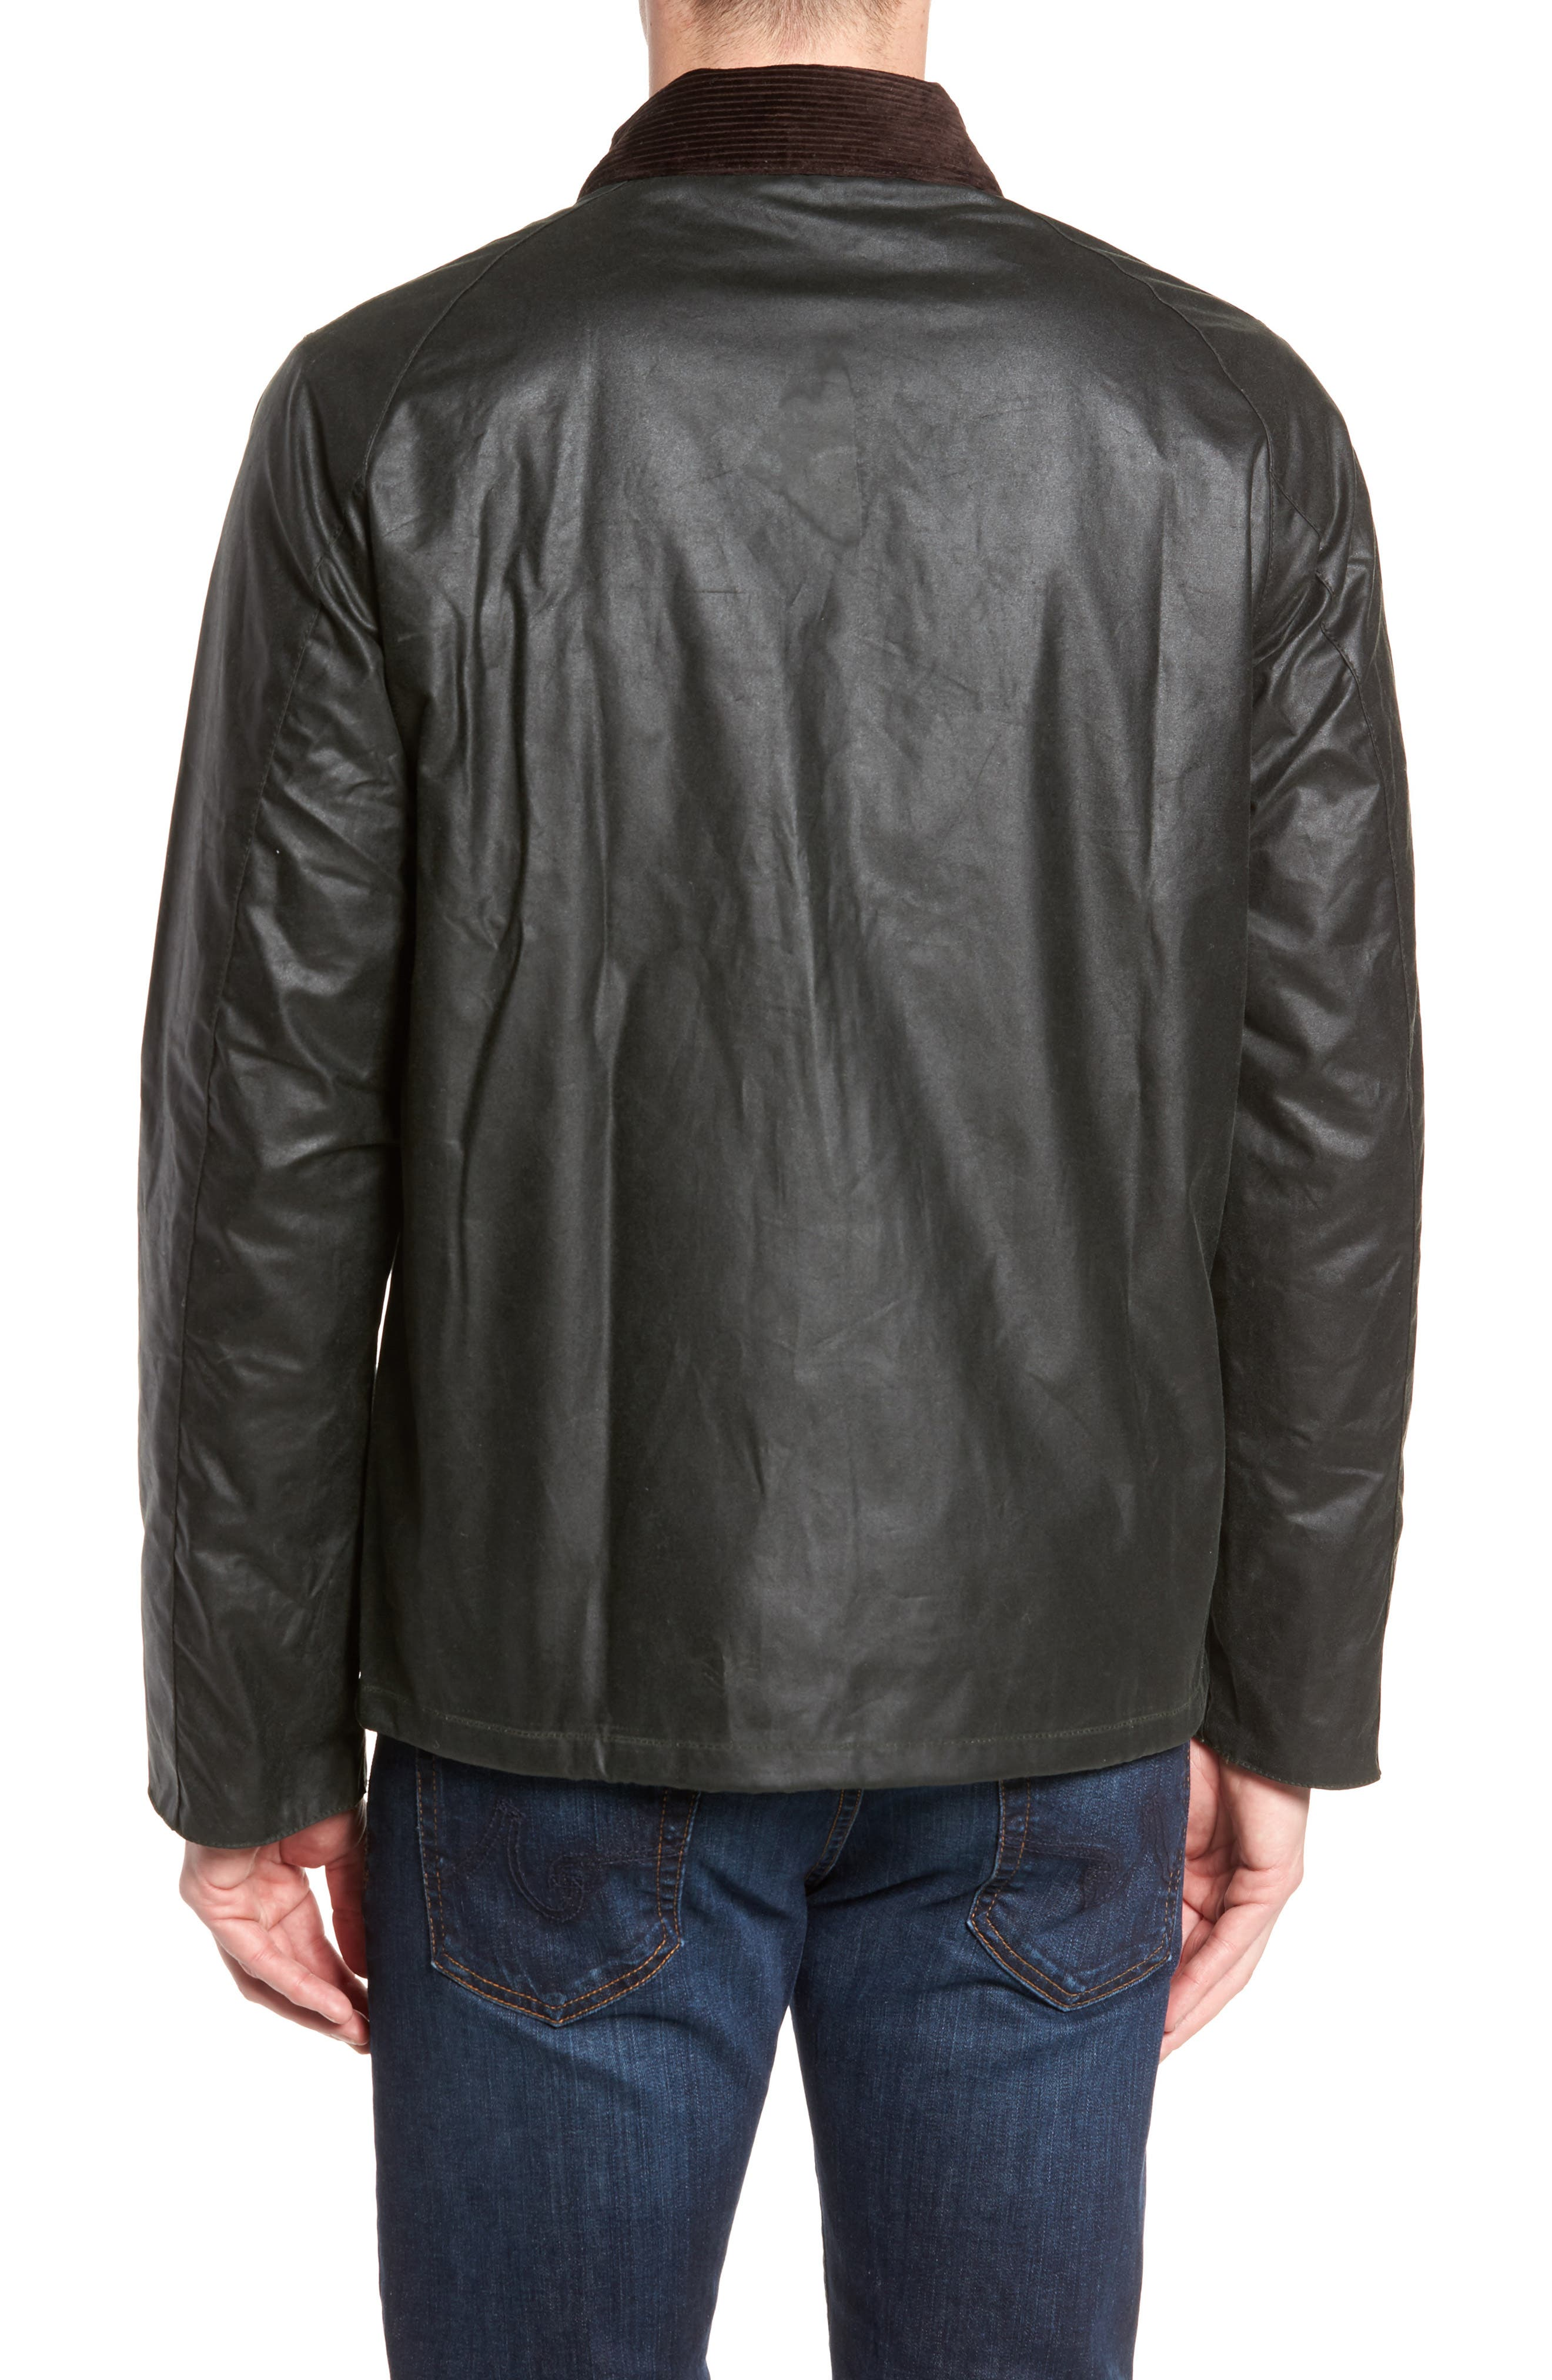 Heskin Waxed Cotton Jacket,                             Alternate thumbnail 2, color,                             SAGE